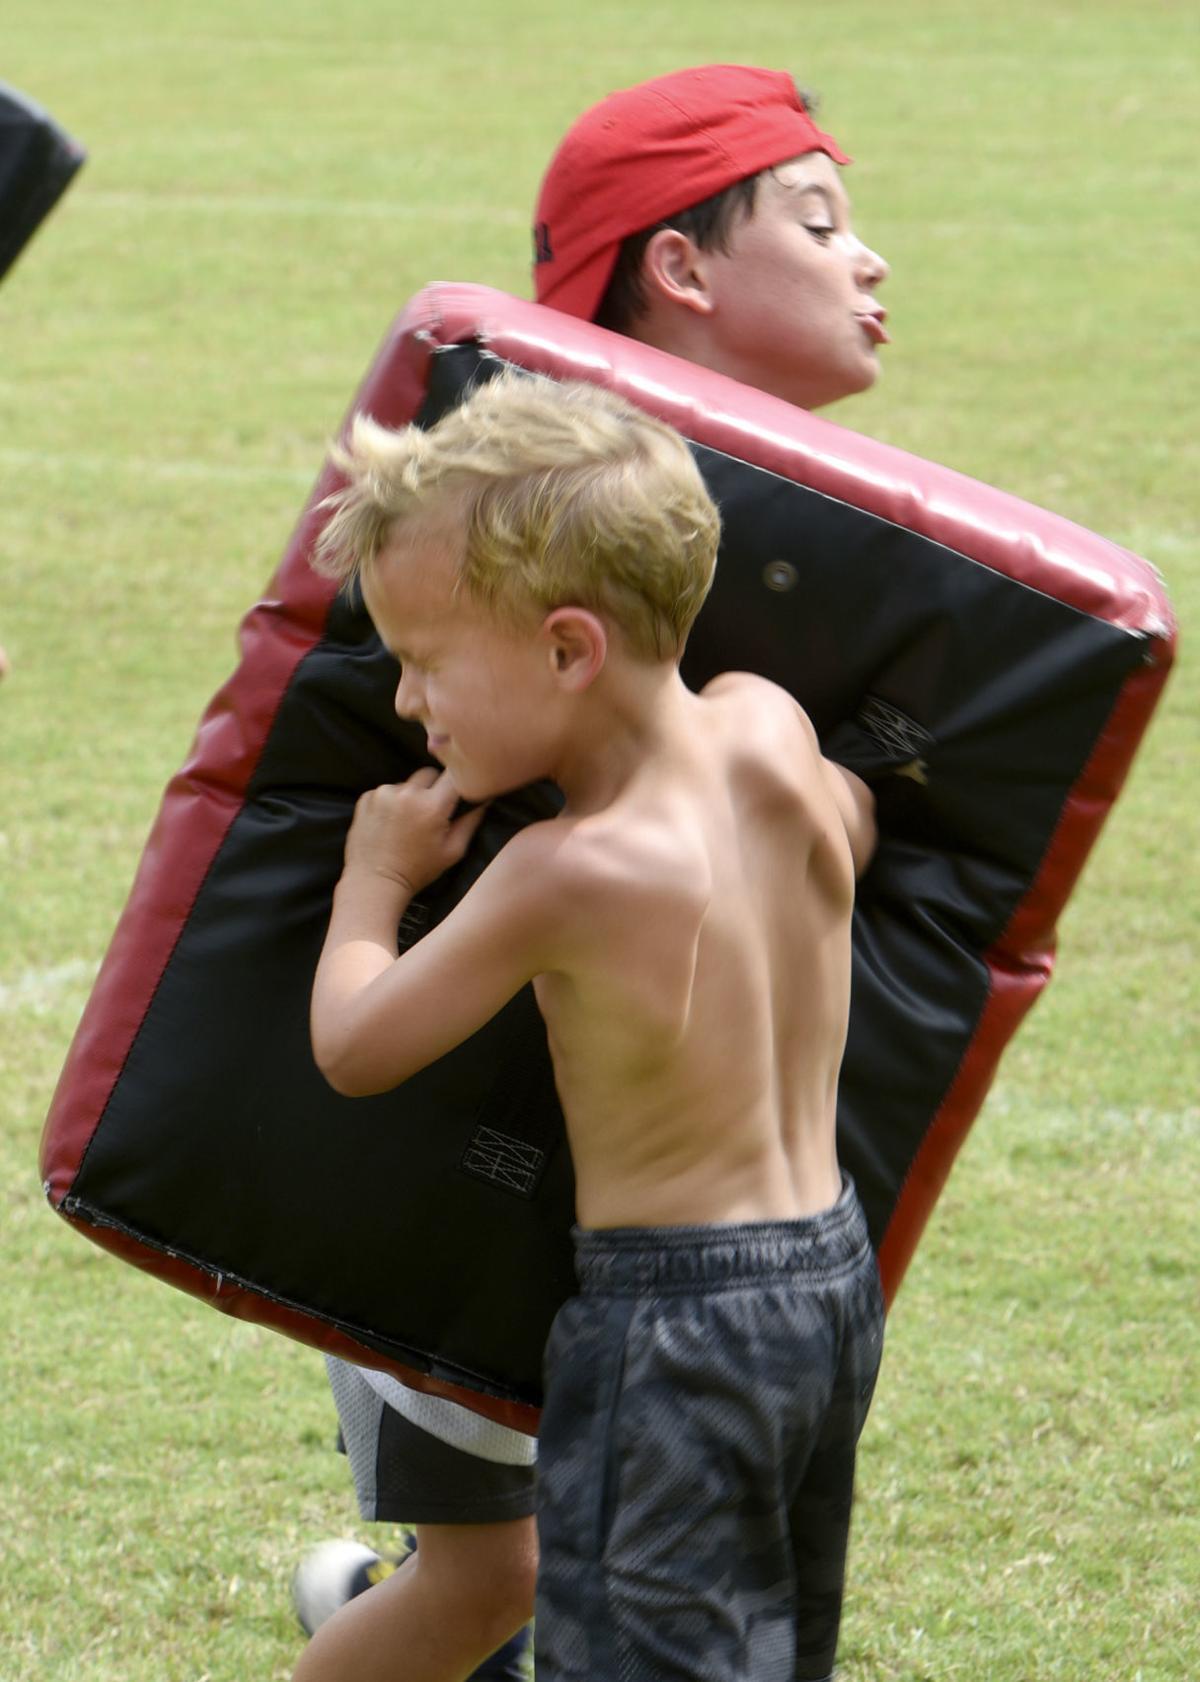 060119_GA football camp 6